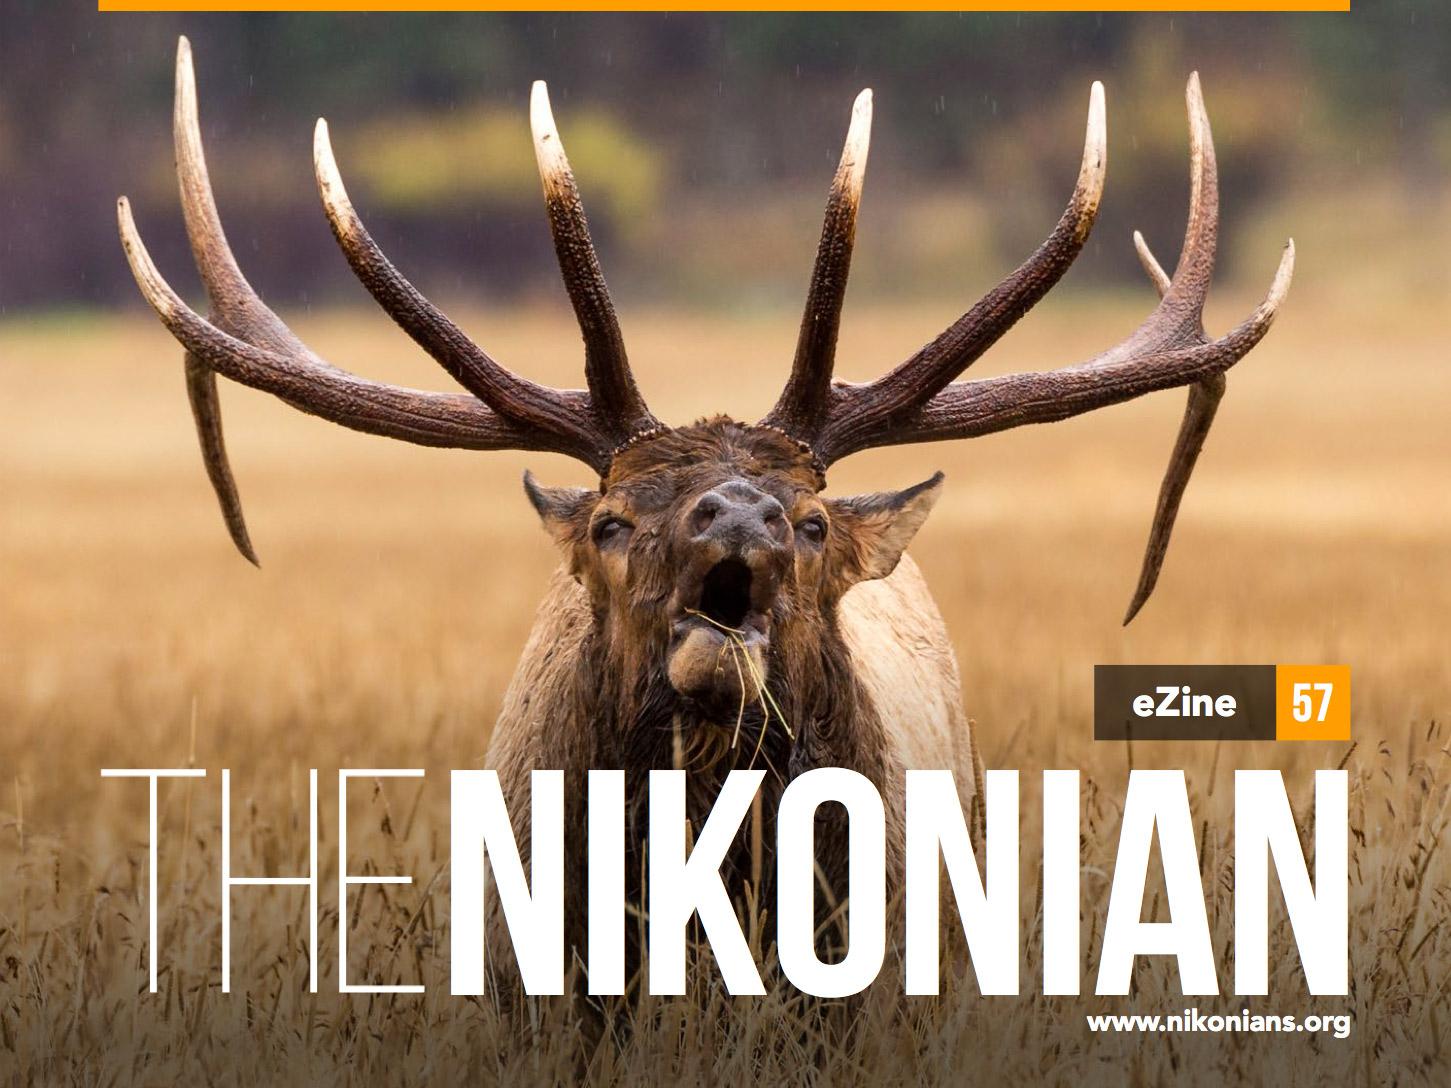 The Nikonian eZine 57